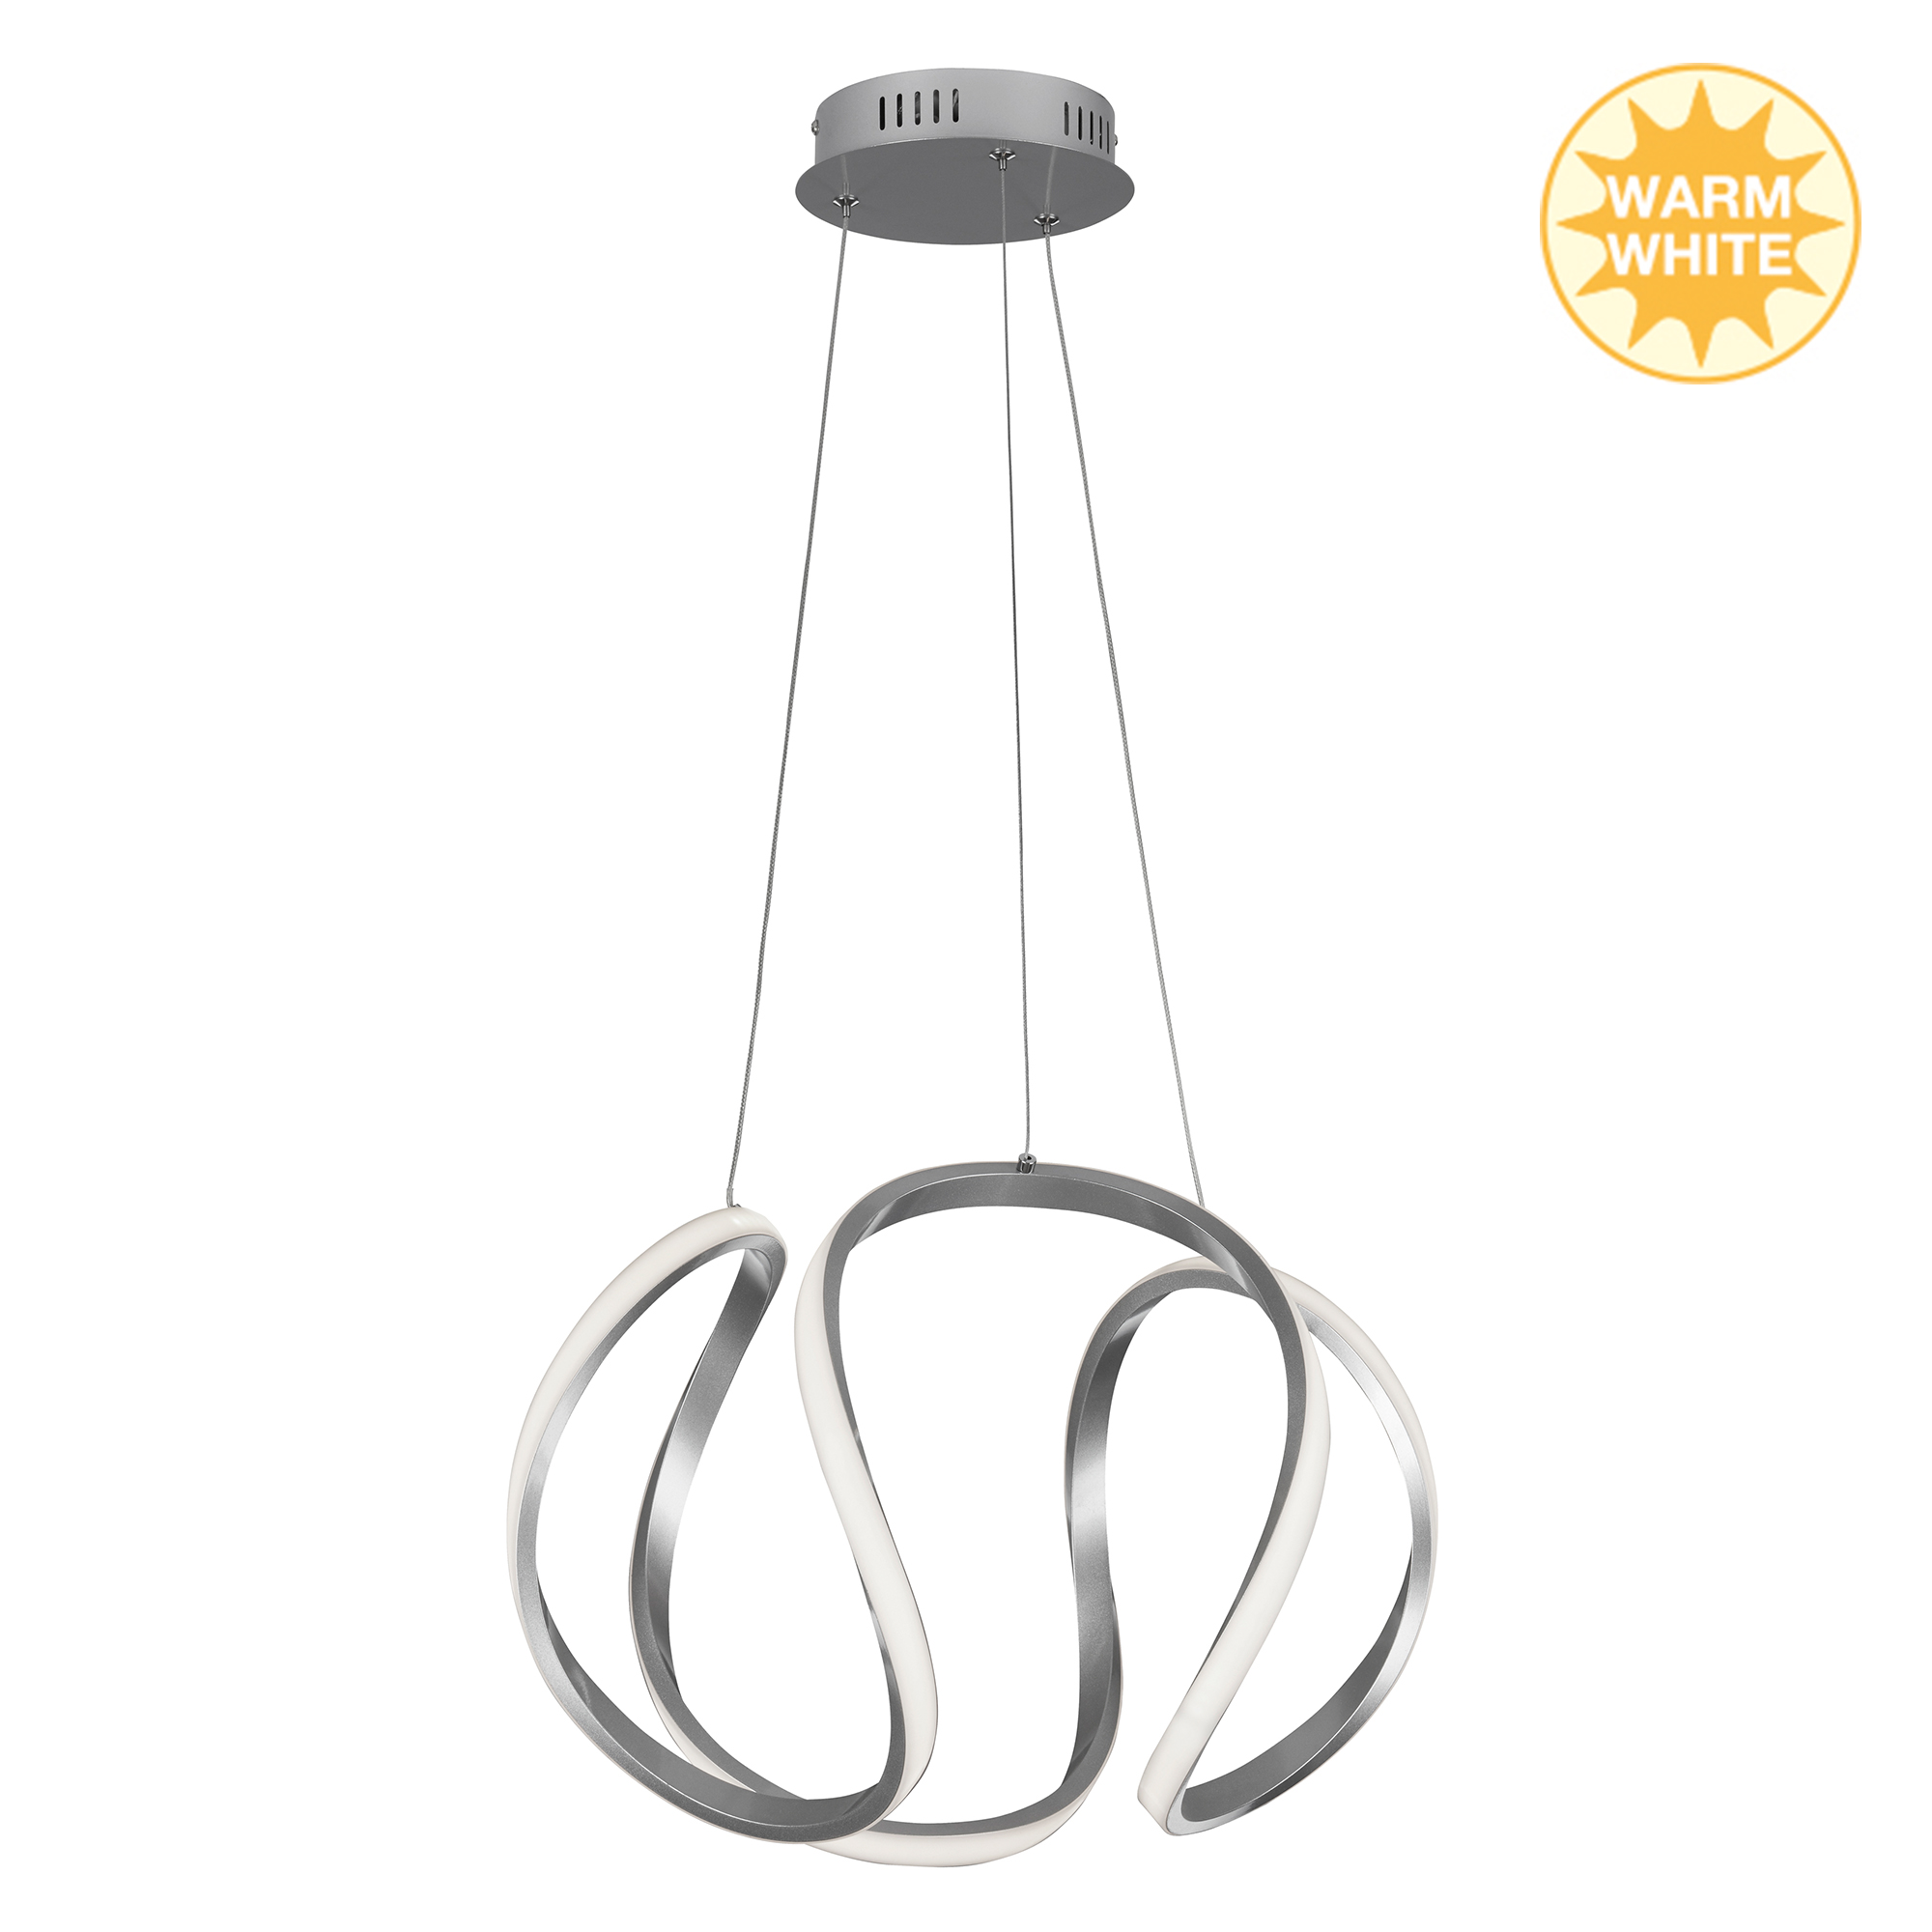 LED Pendelleuchte, Ø 42,5 cm, 40 W, Alu